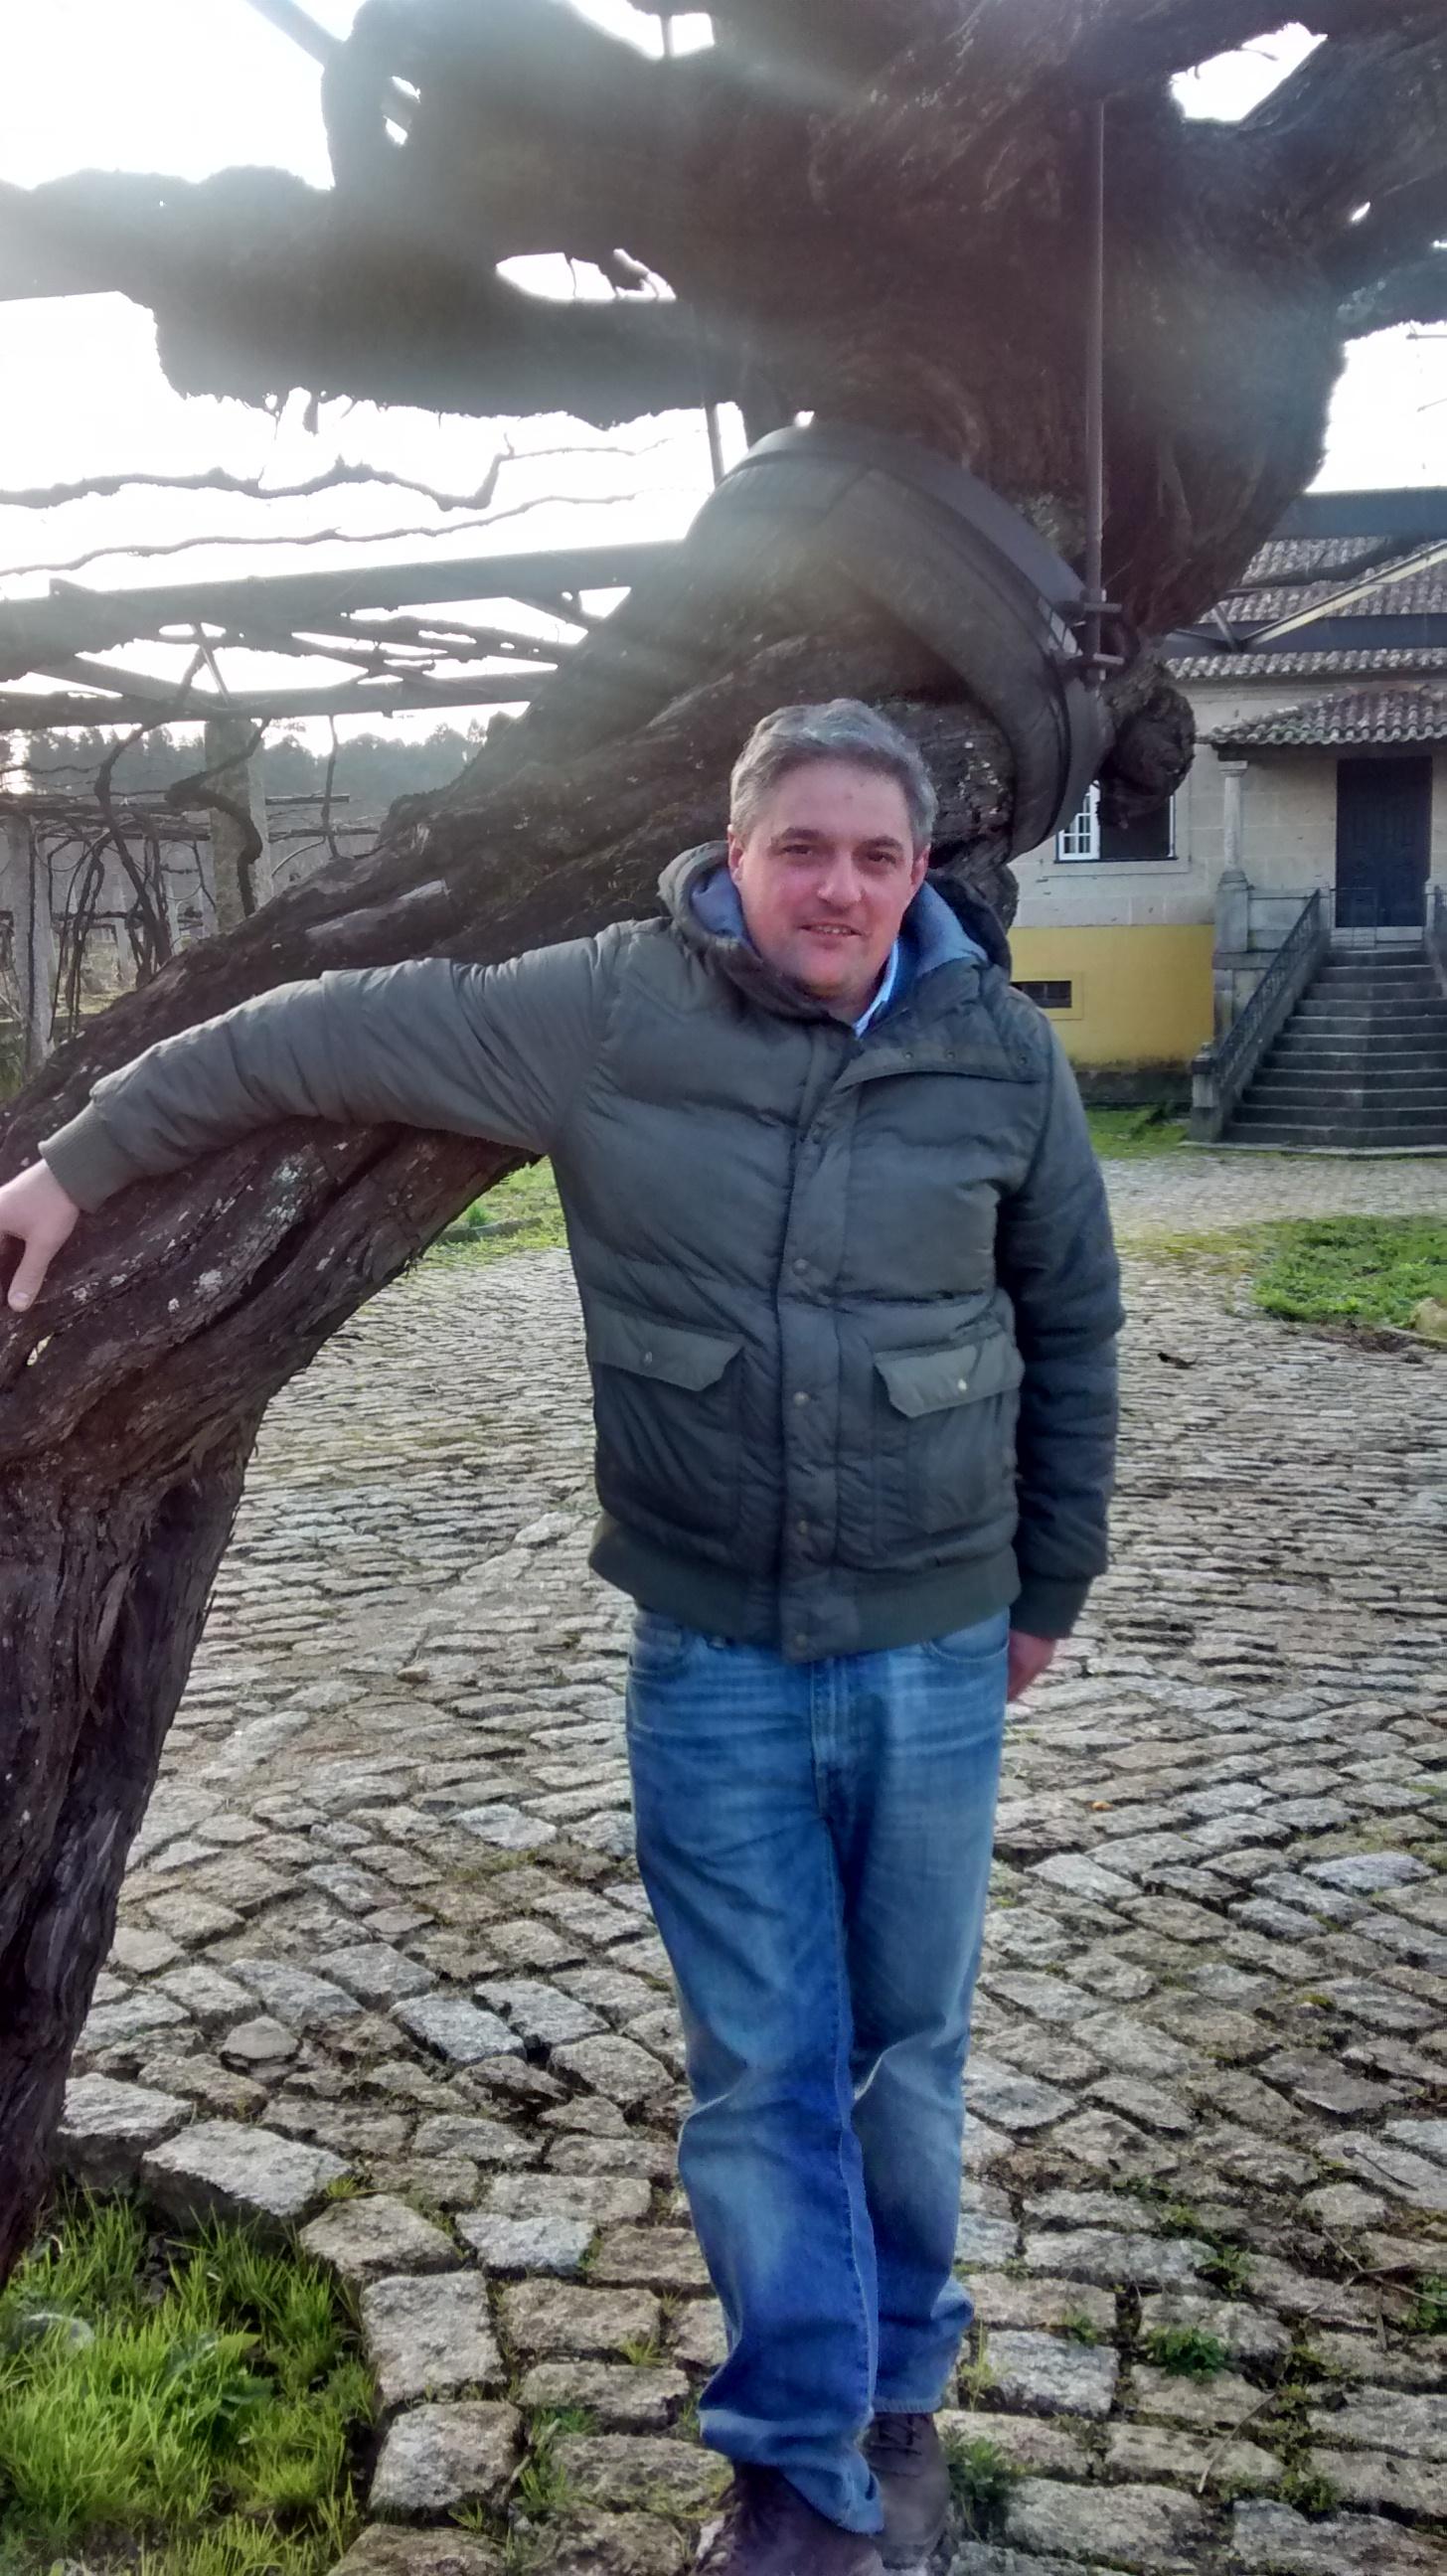 Oenologist Carlos Blanco